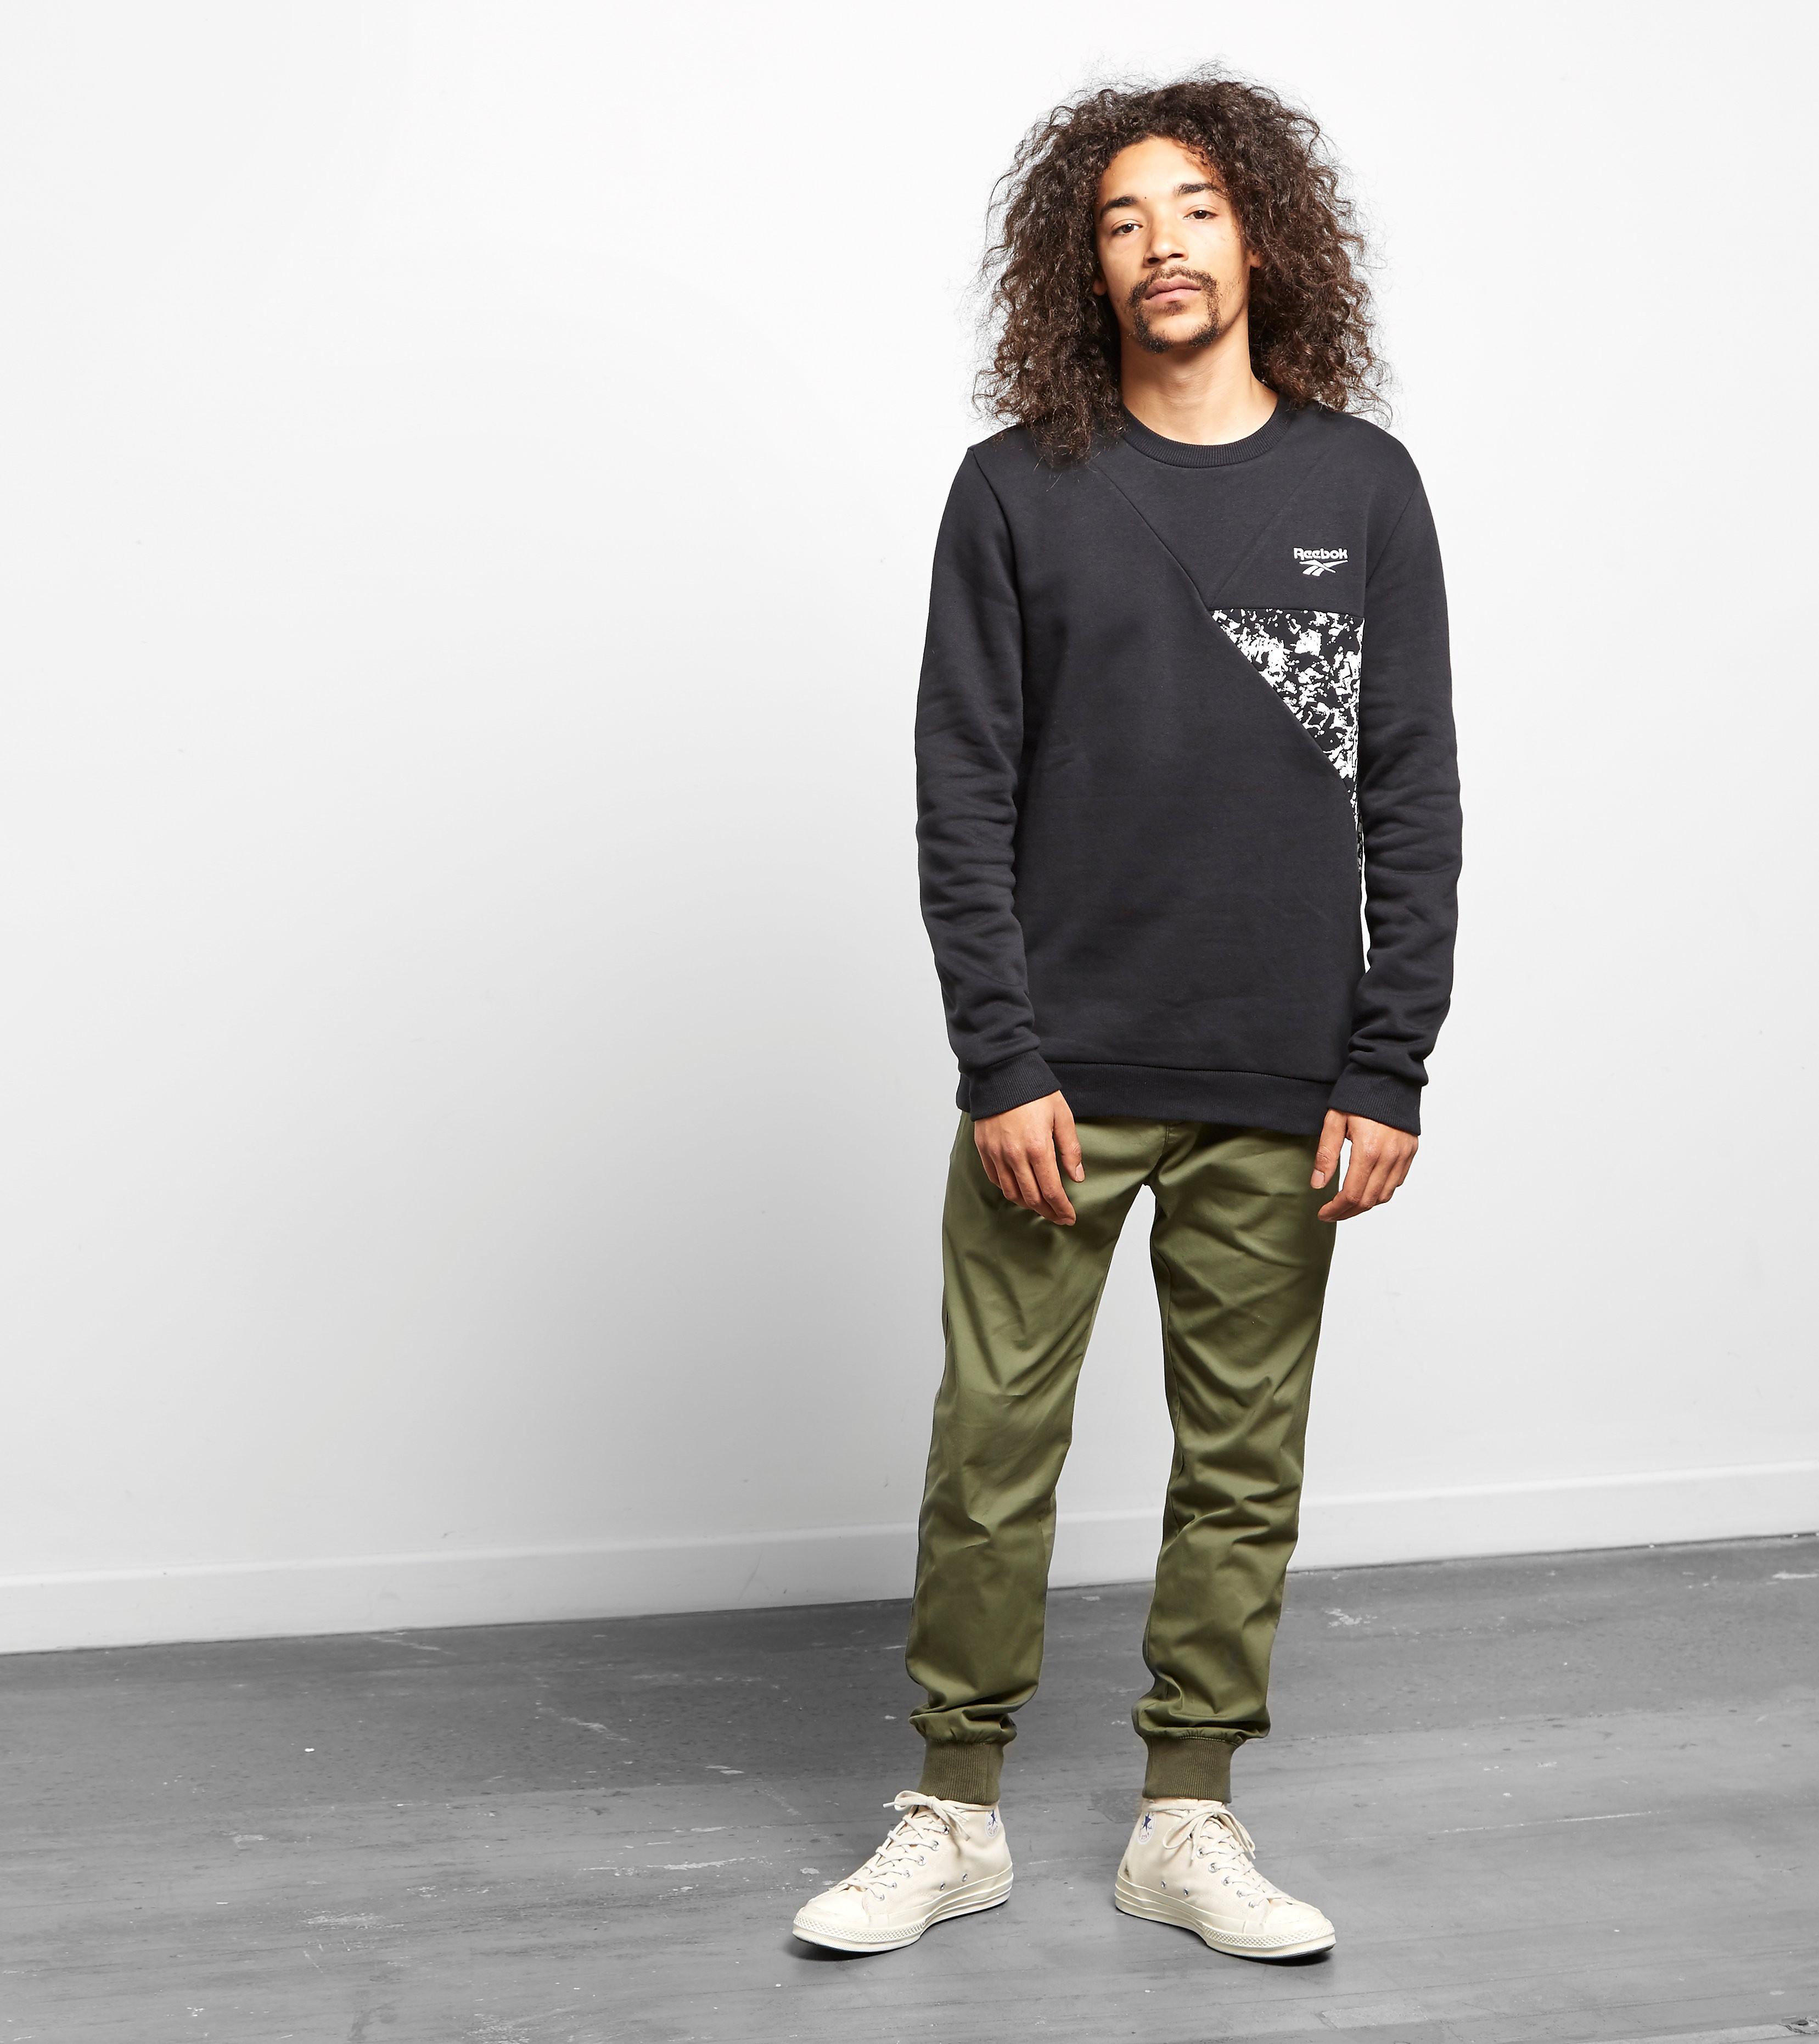 Reebok LF Crew Neck Sweatshirt